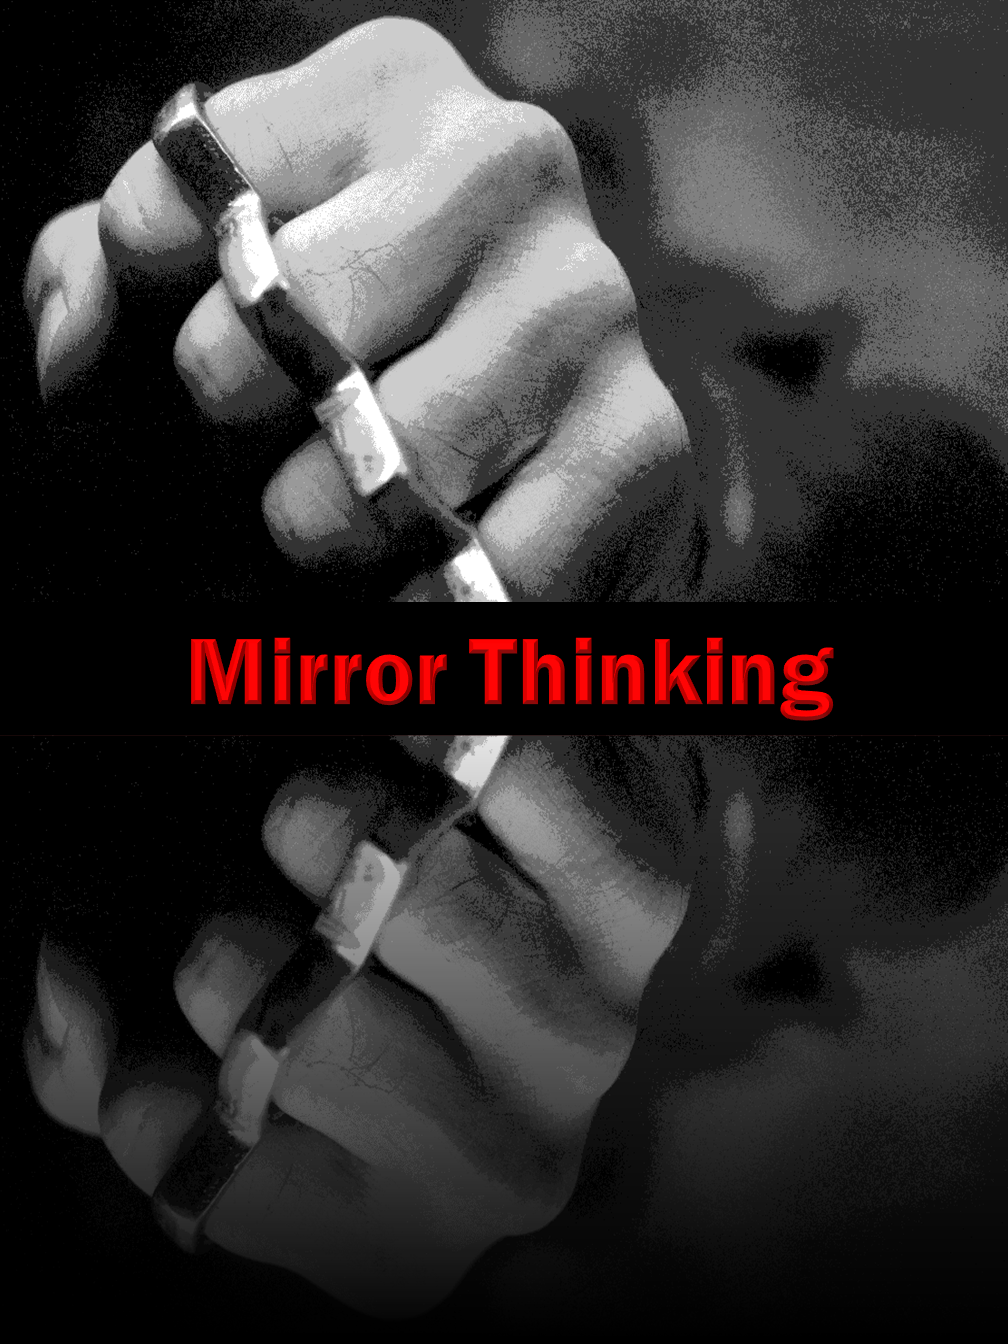 Mirror Thinking!